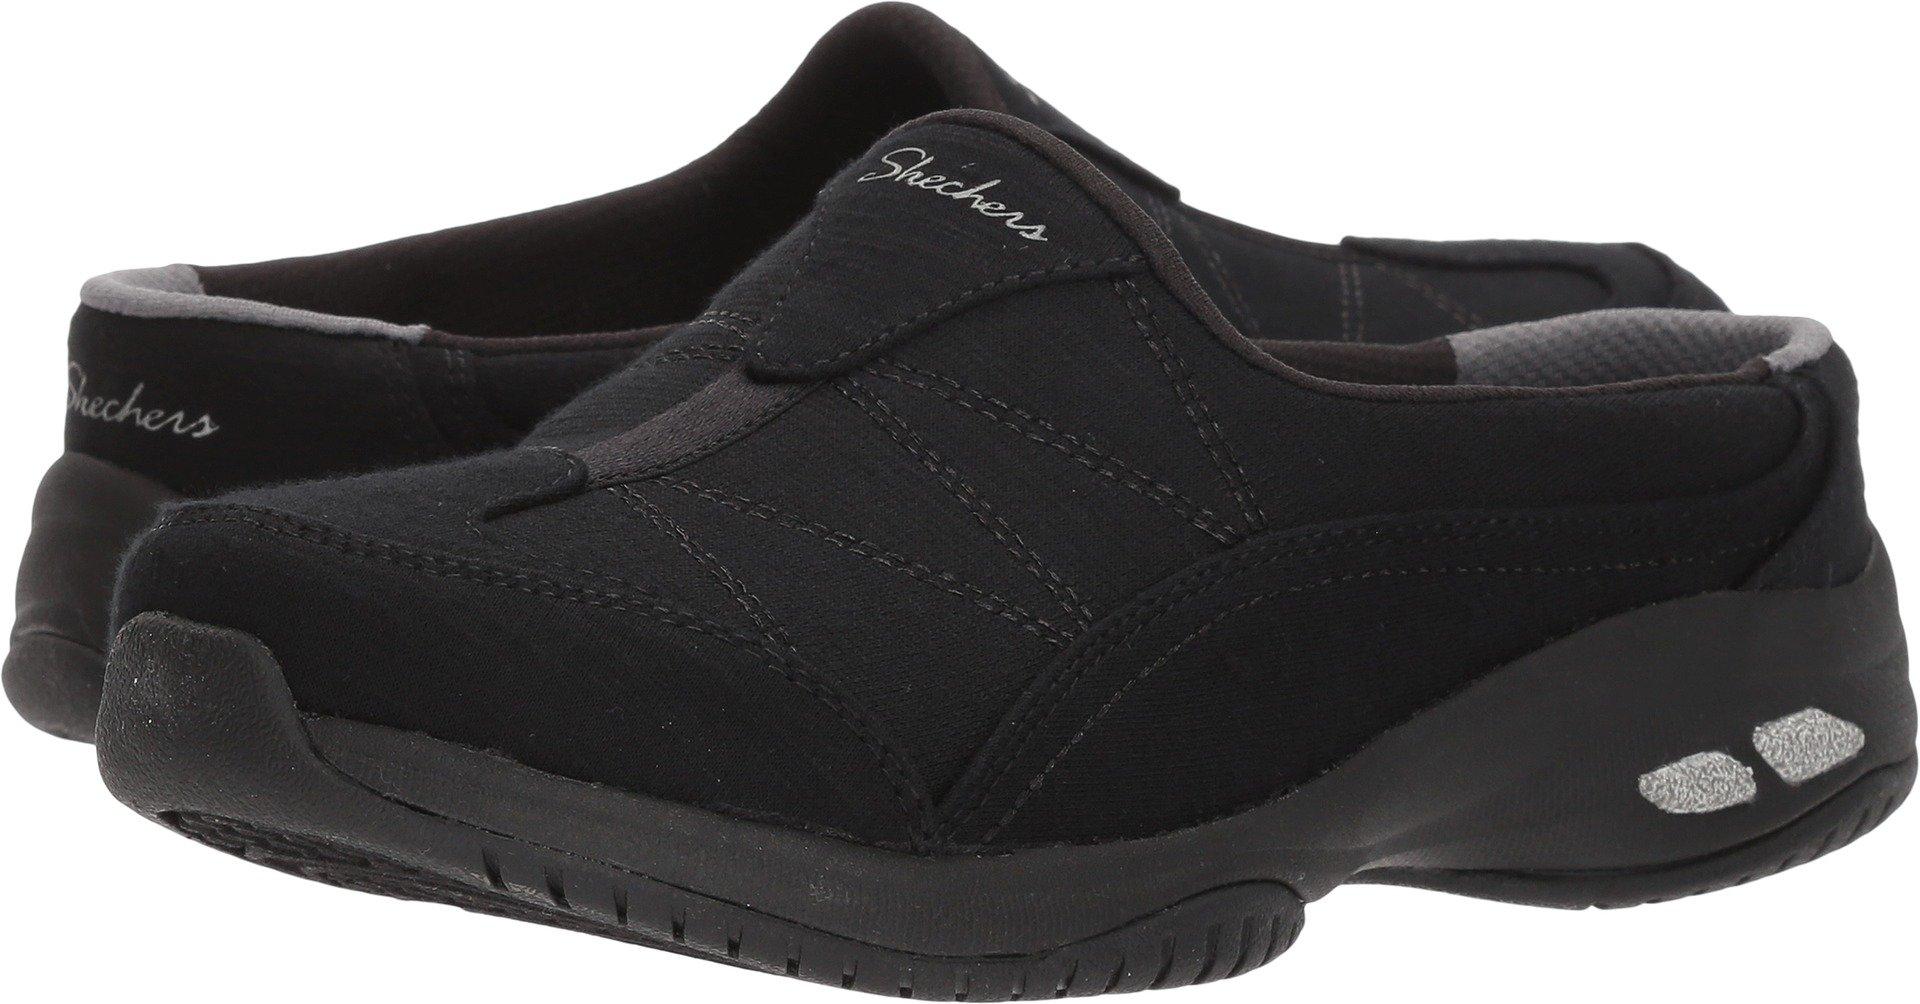 Skechers Women's Commute-Carpool-Heathered Deco Stitch Mule, Black/Black, 8 M US